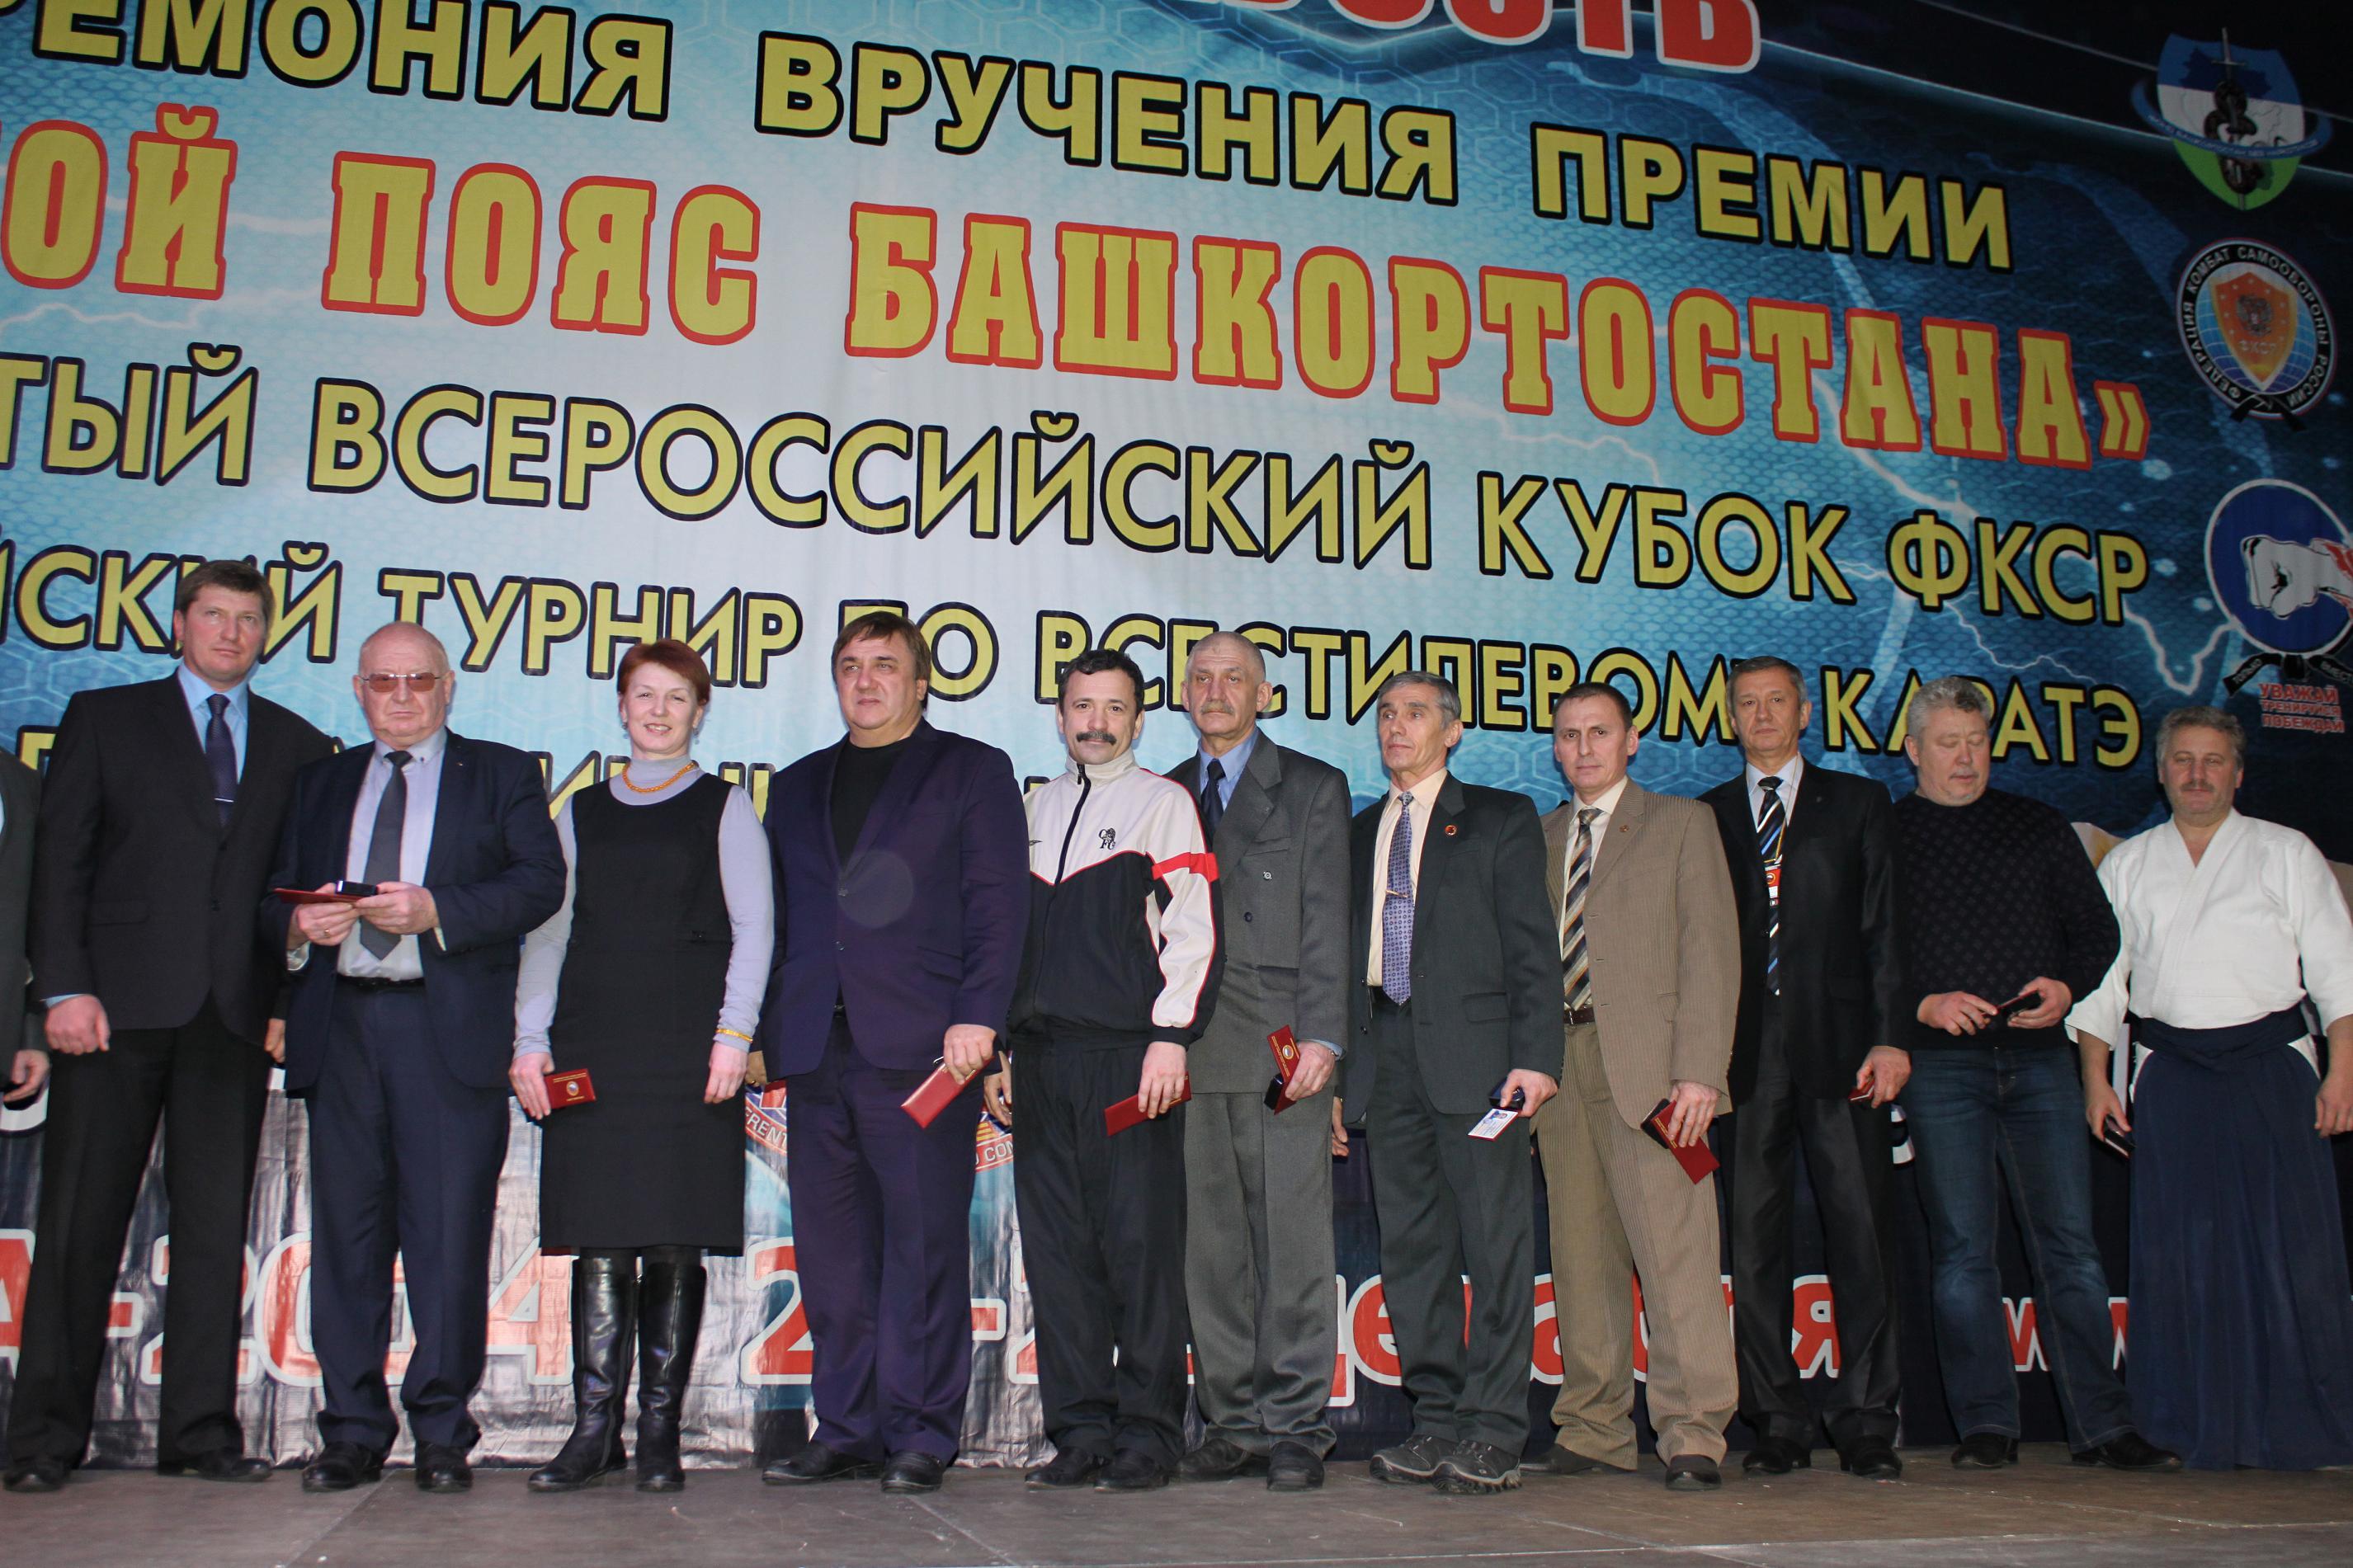 http://sbirb.combatsd.ru/images/upload/IMG_9750.JPG